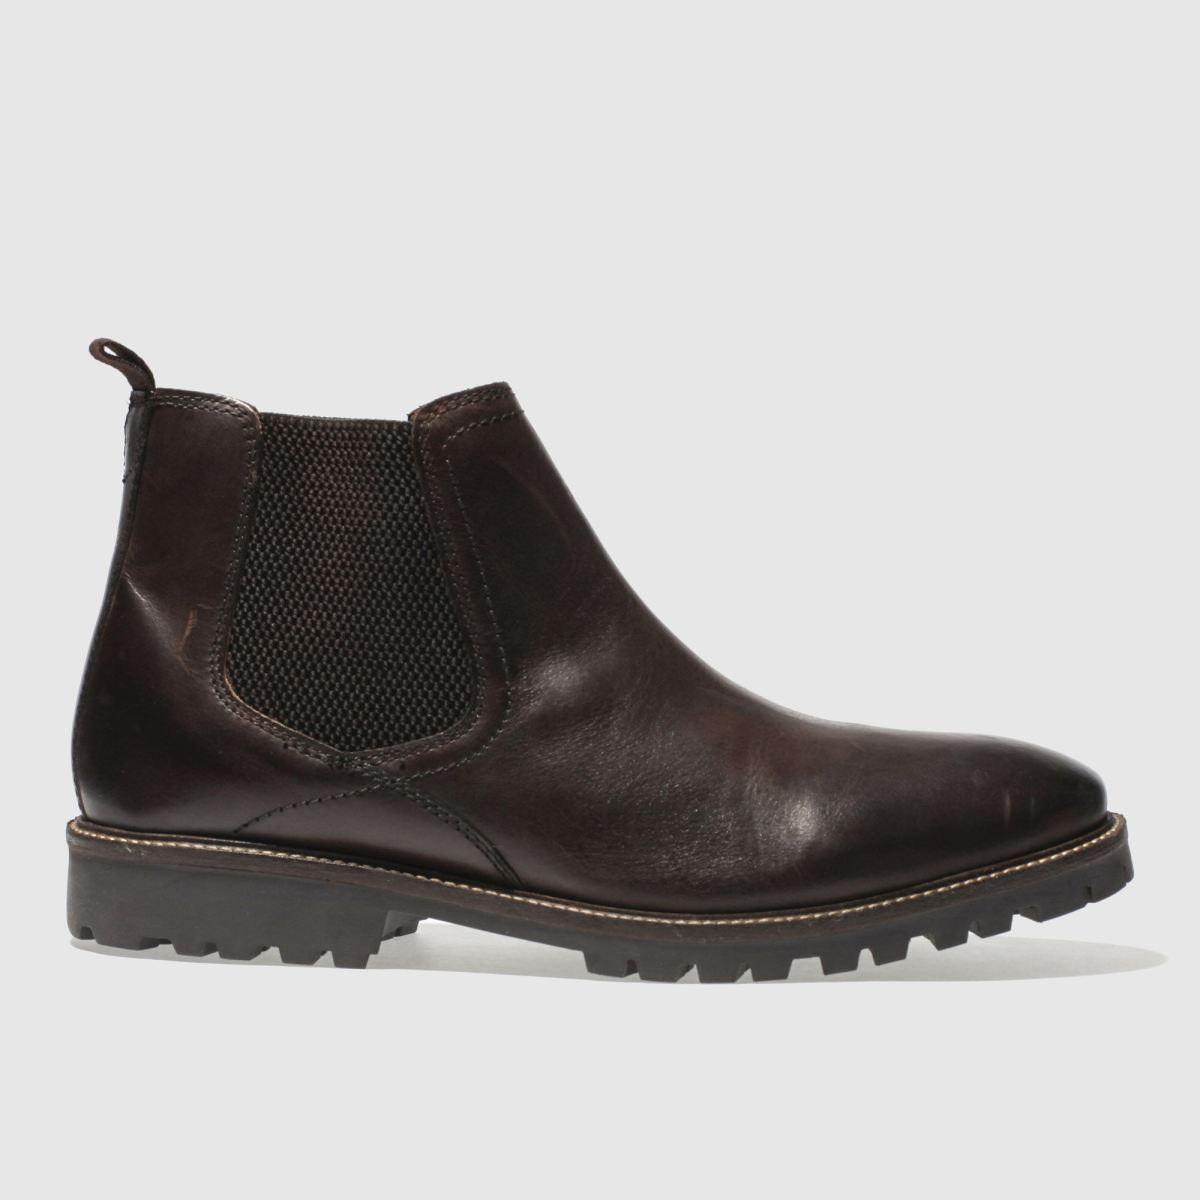 Ikon Dark Brown Duster Chelsea Boots